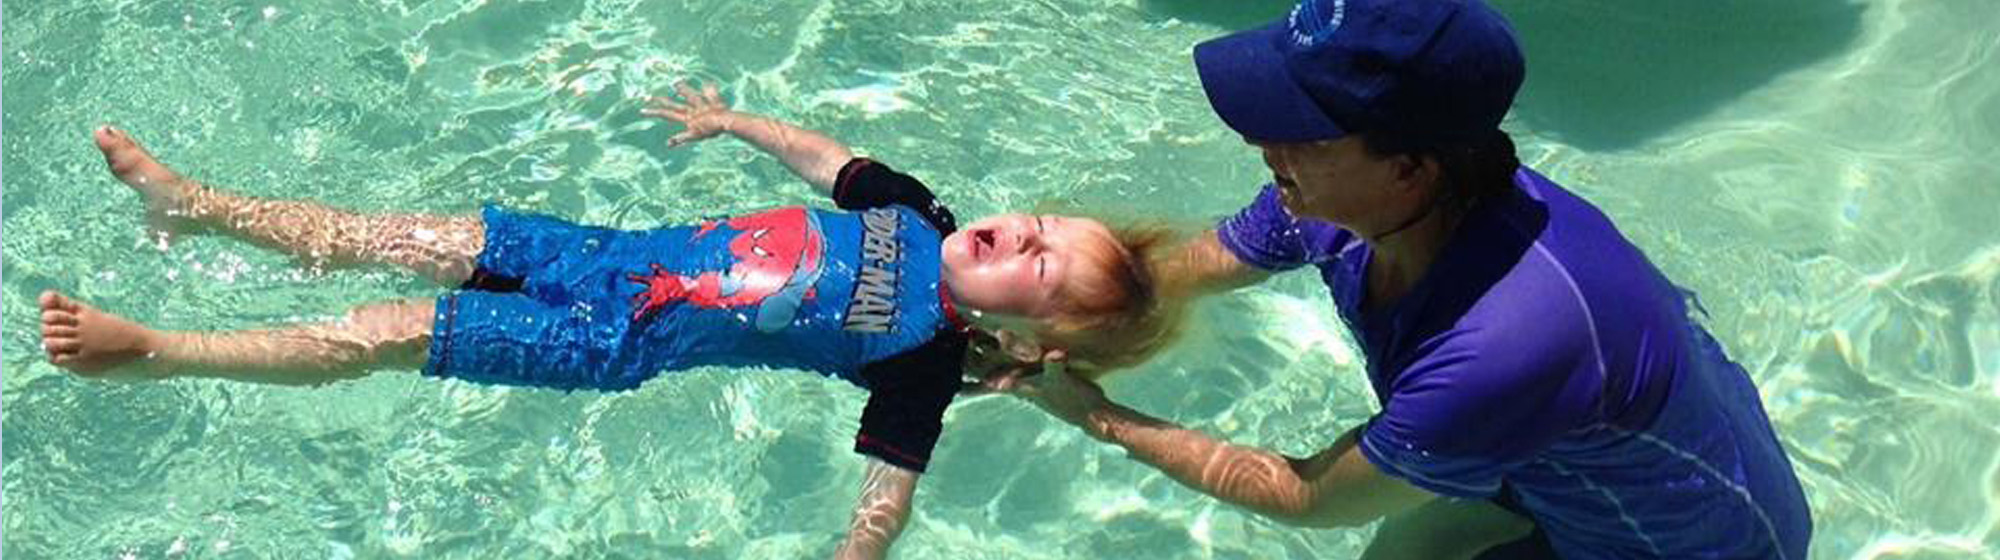 Baby_Swimming-lessons-in-perth-australia